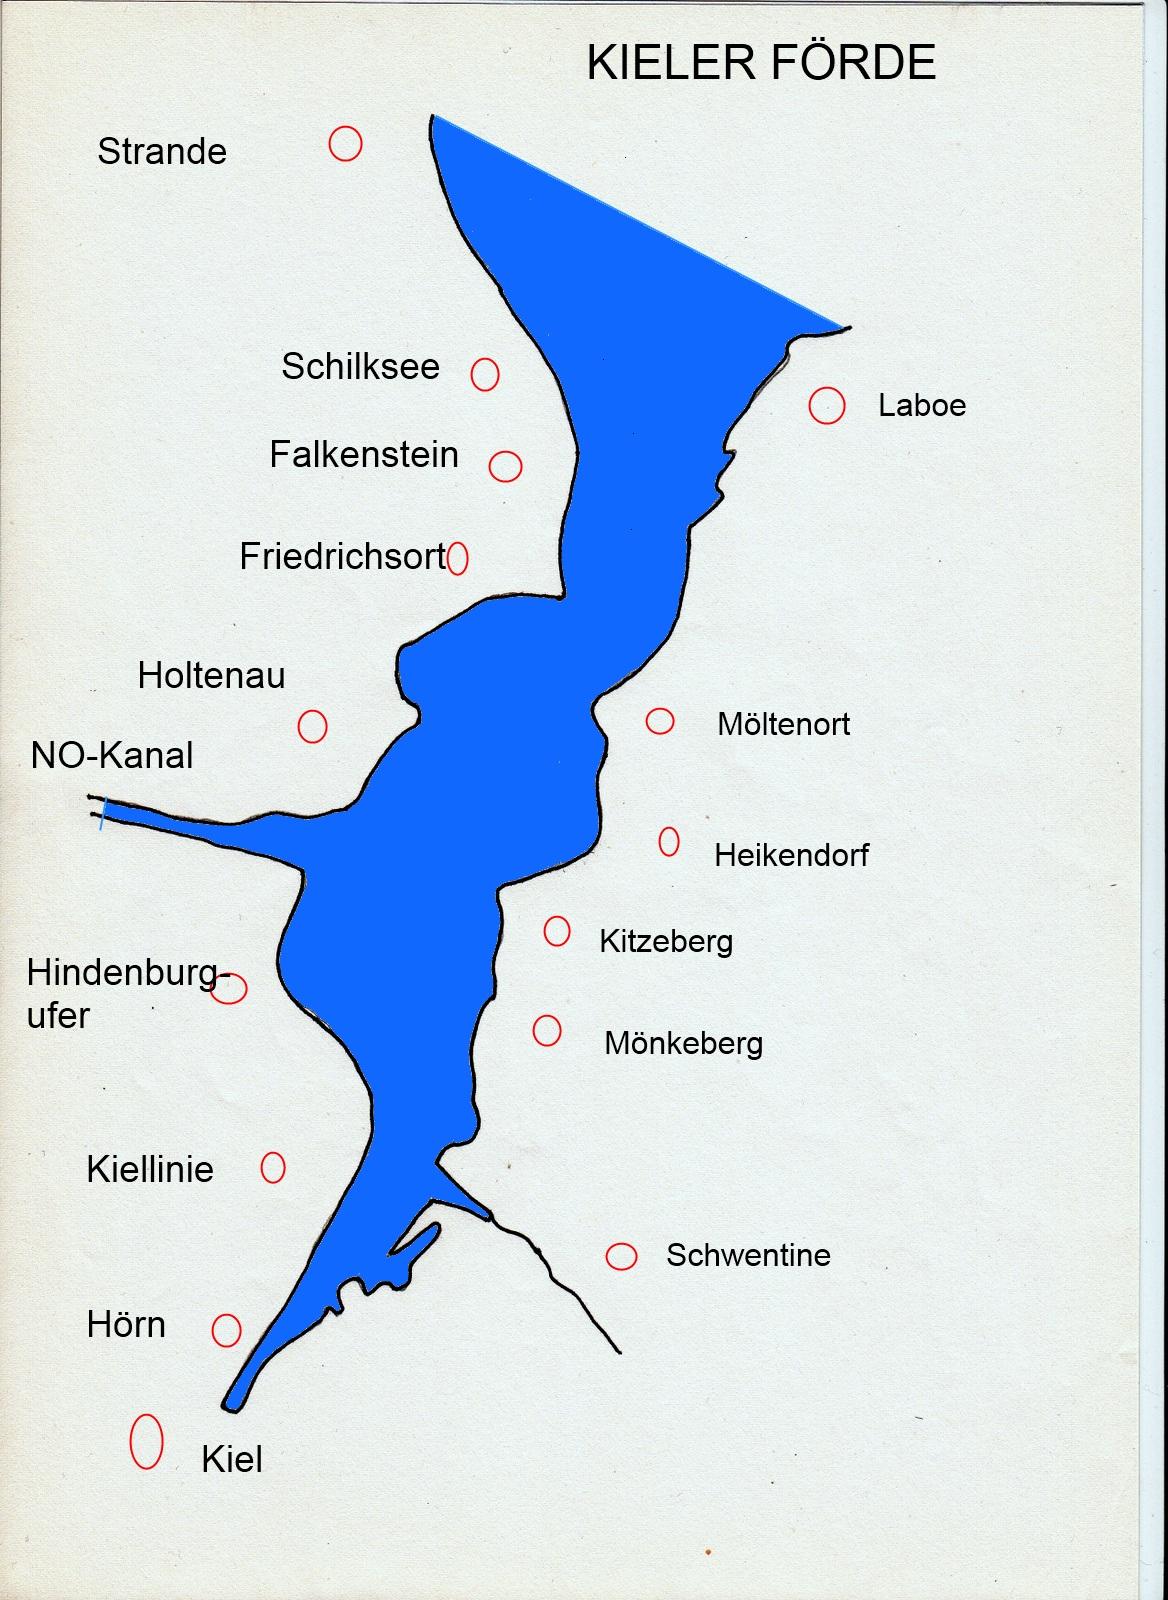 Kieler Förde Karte